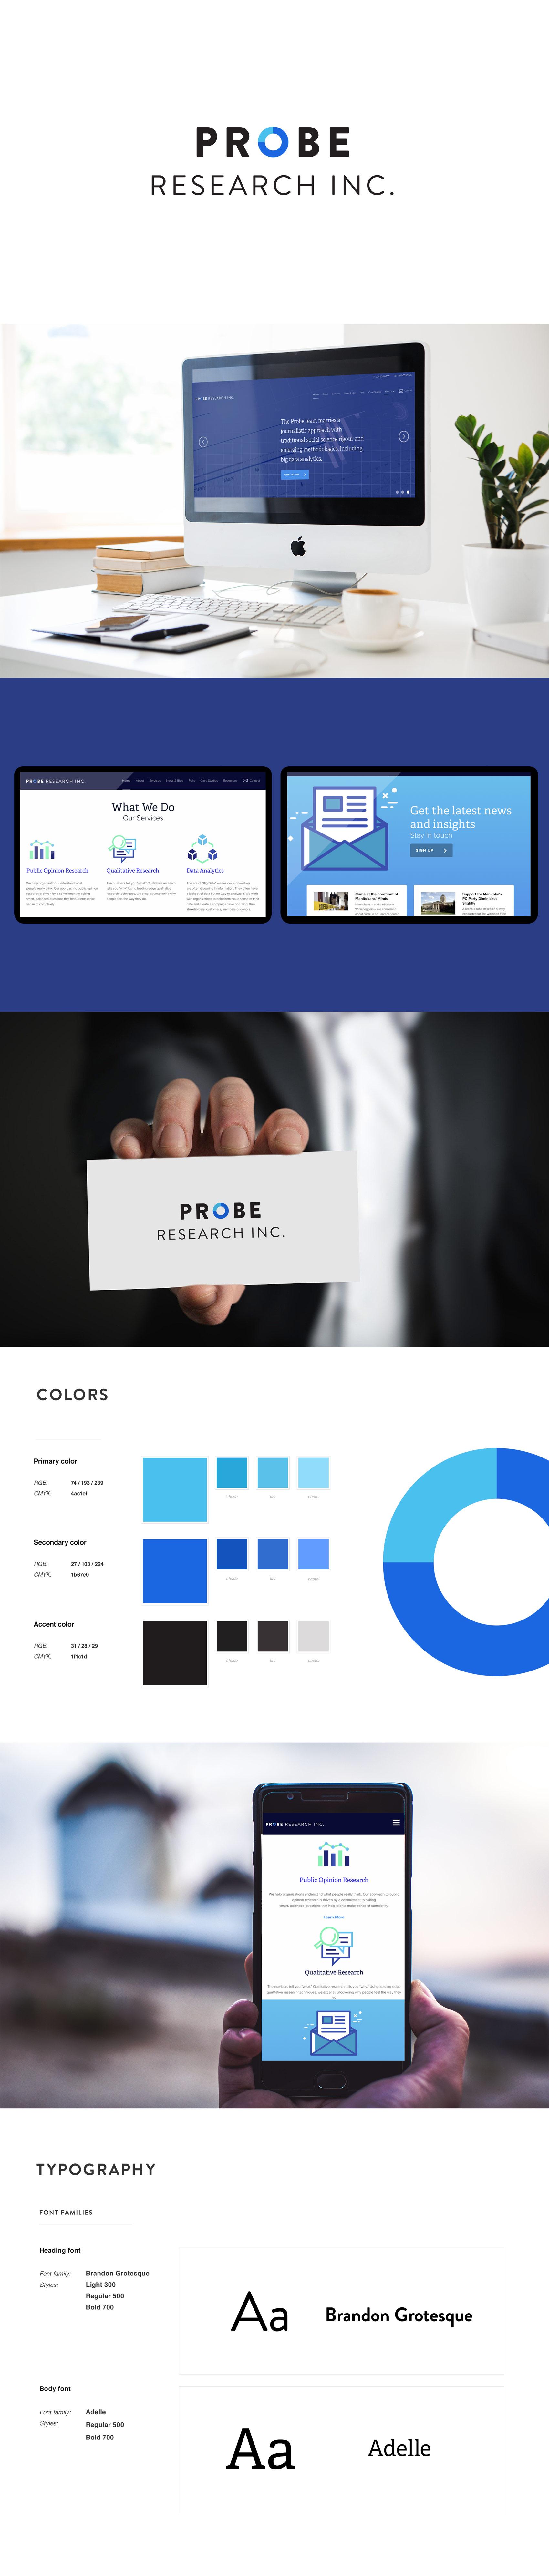 PROBE_RESEARCH_MOCKUP-design-winnipeg-logo.jpg